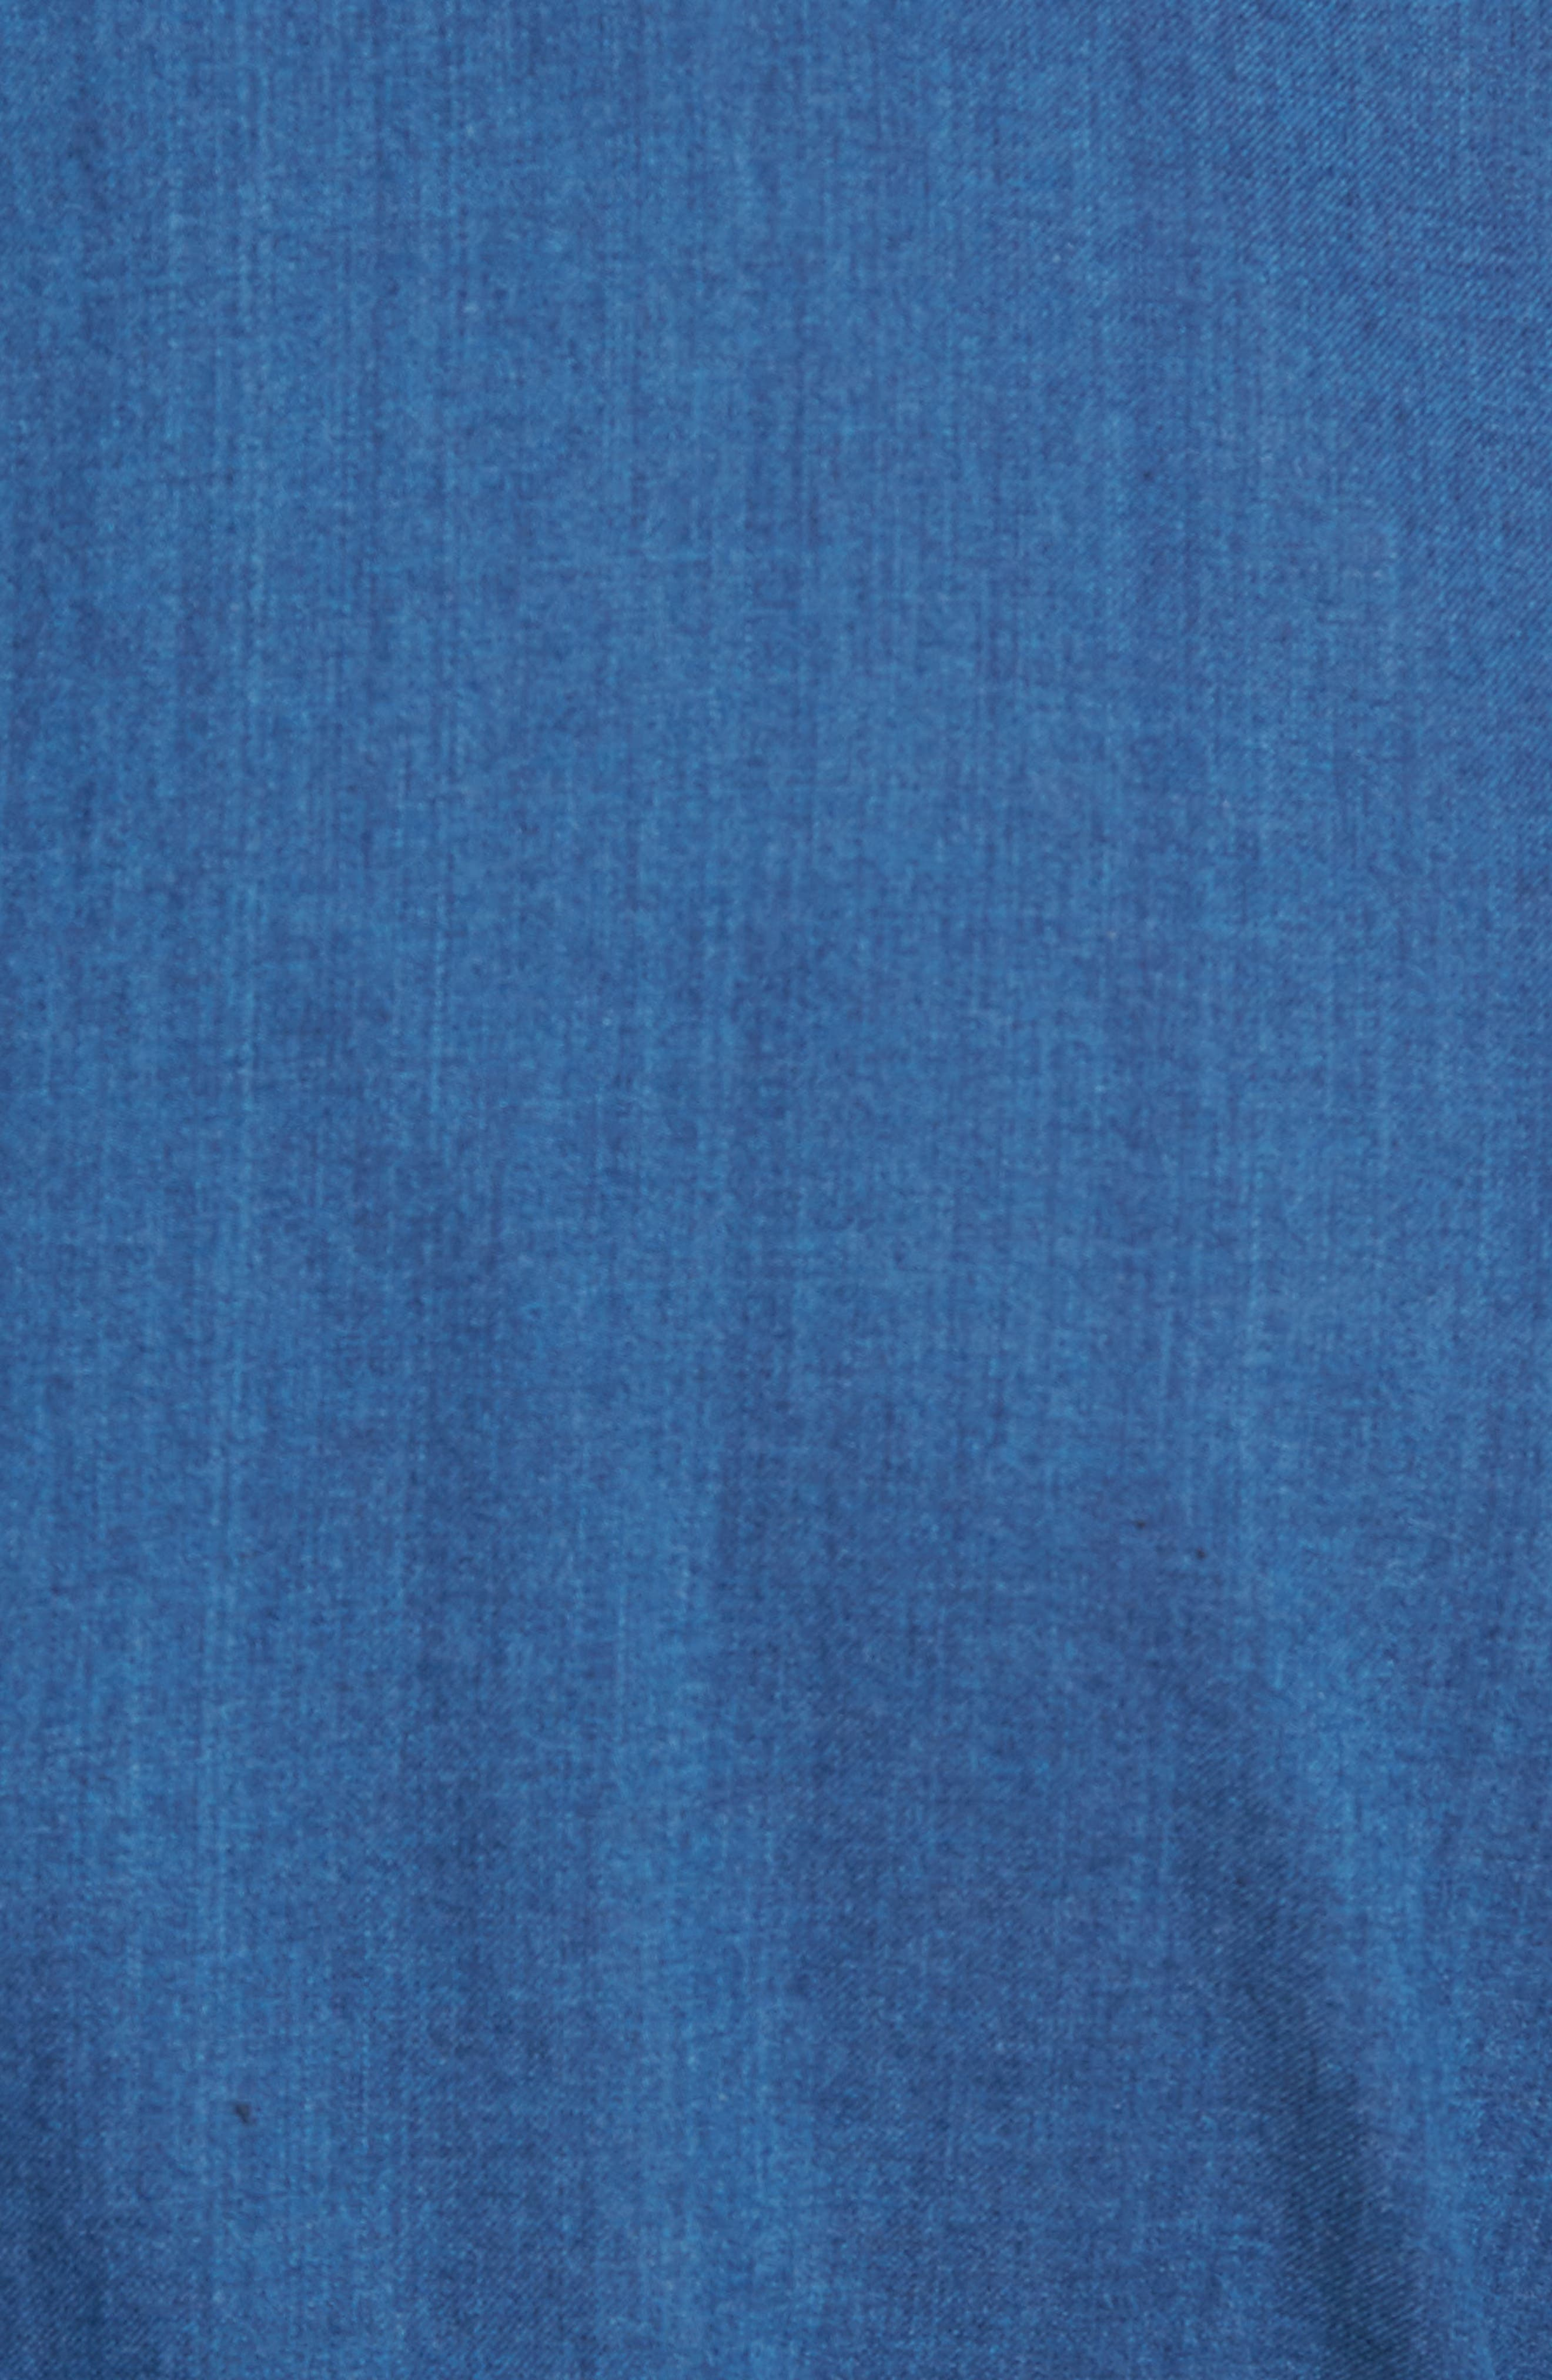 Crown Vintage Regular Fit Denim Sport Shirt,                             Alternate thumbnail 5, color,                             405